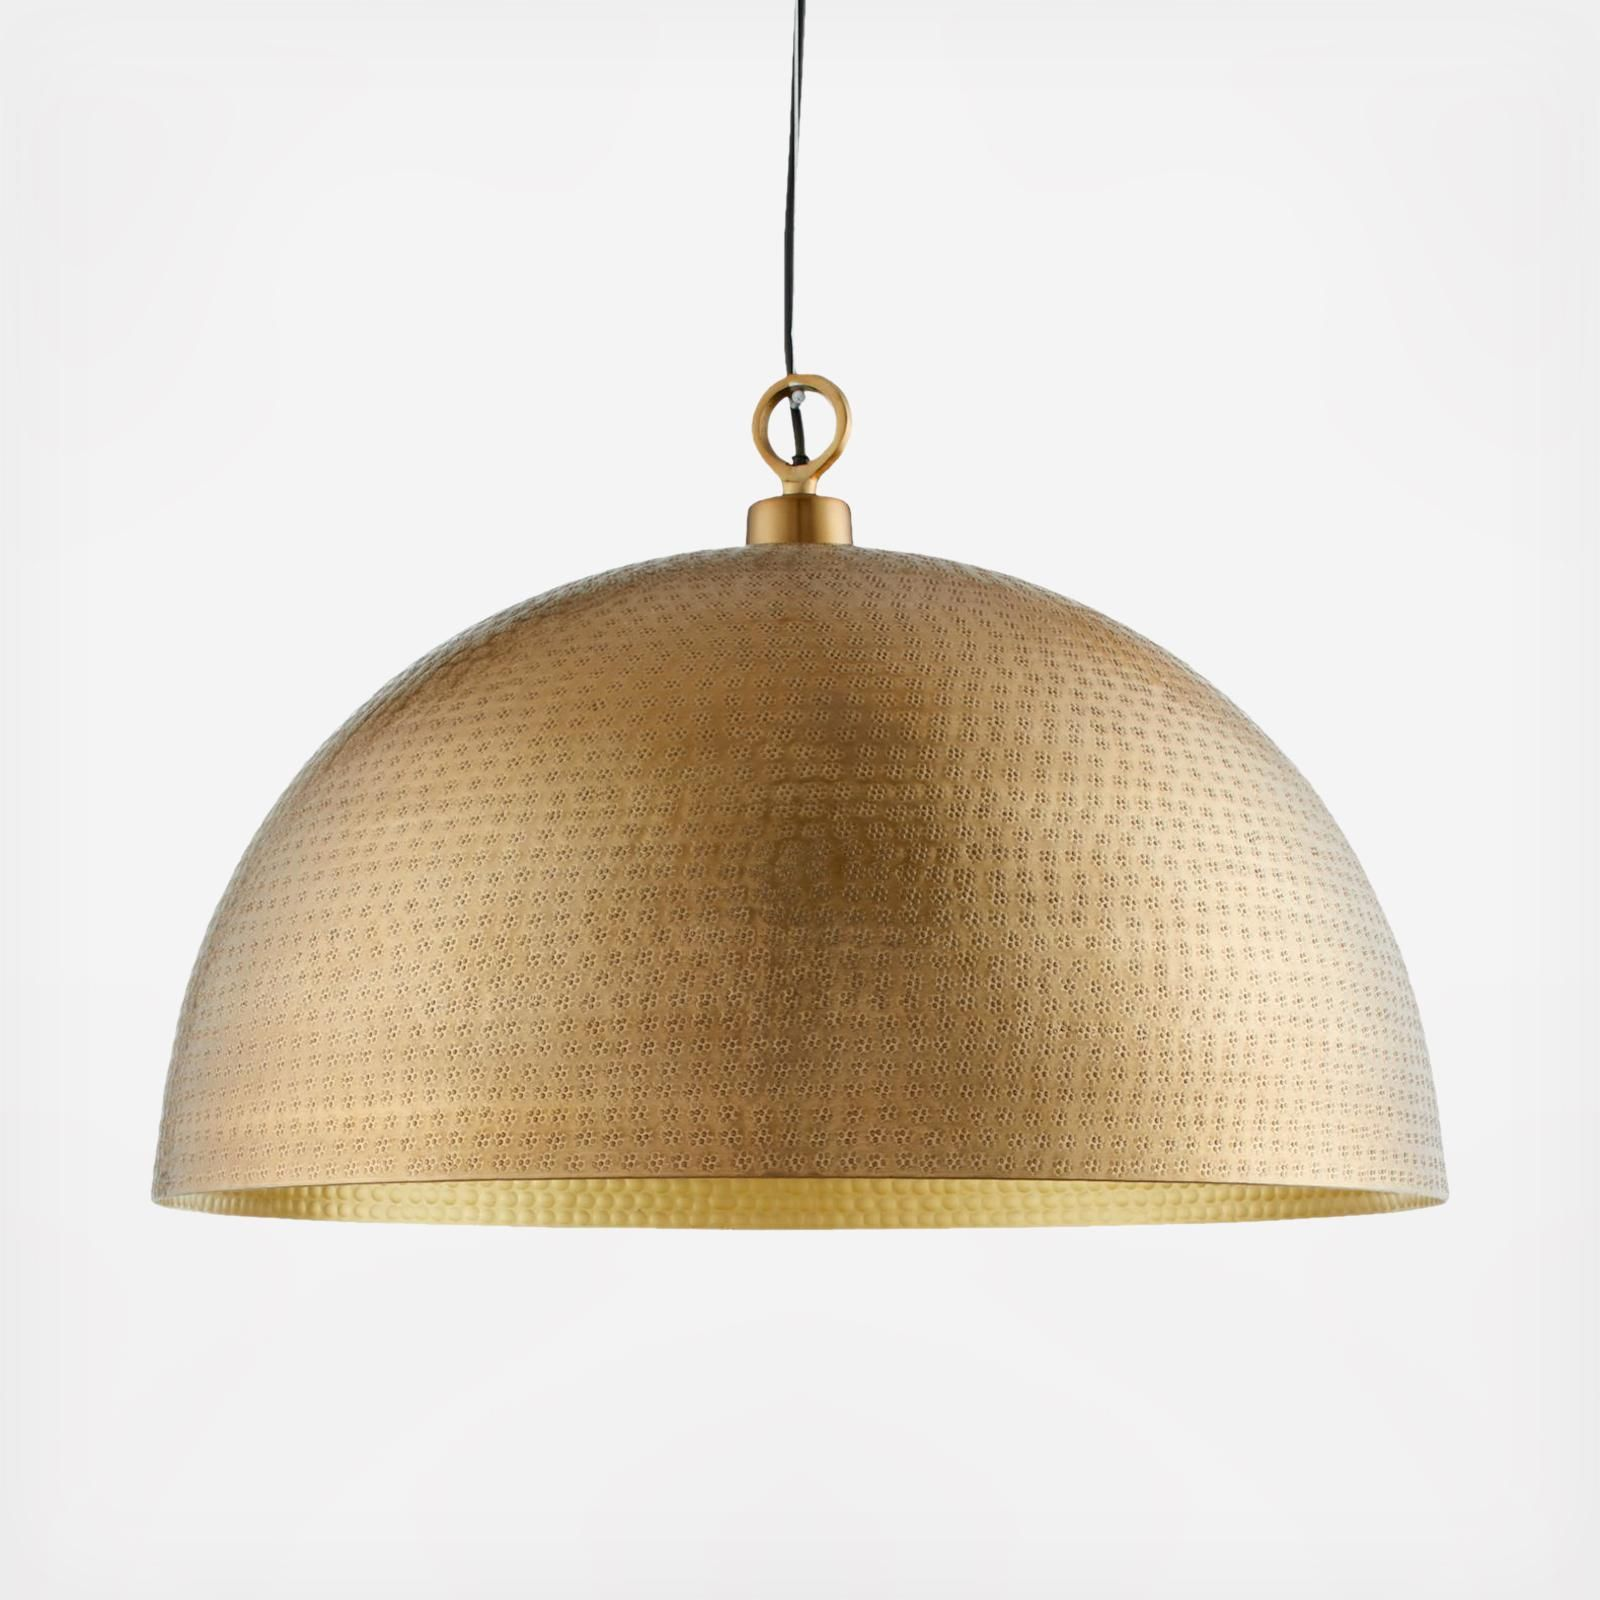 Crate And Barrel Rodan Hammered Metal Dome Pendant Light In 2021 Dome Pendant Lighting Brass Light Fixture Pendant Light